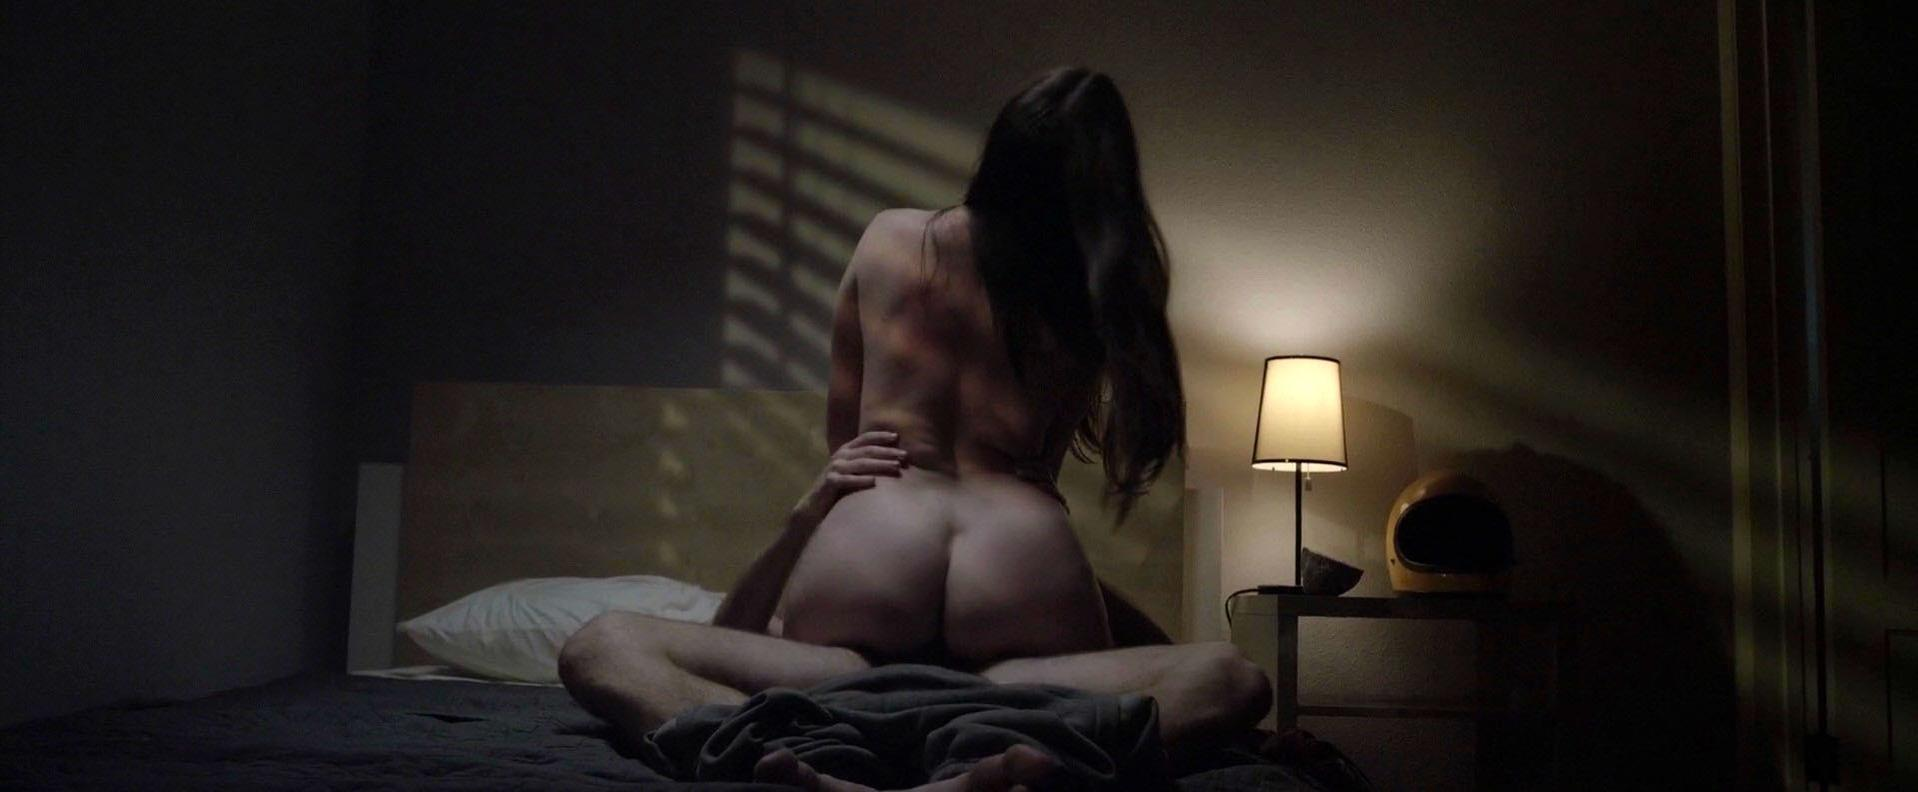 Lena Dunham Slams Unrealistic Sex Scenes